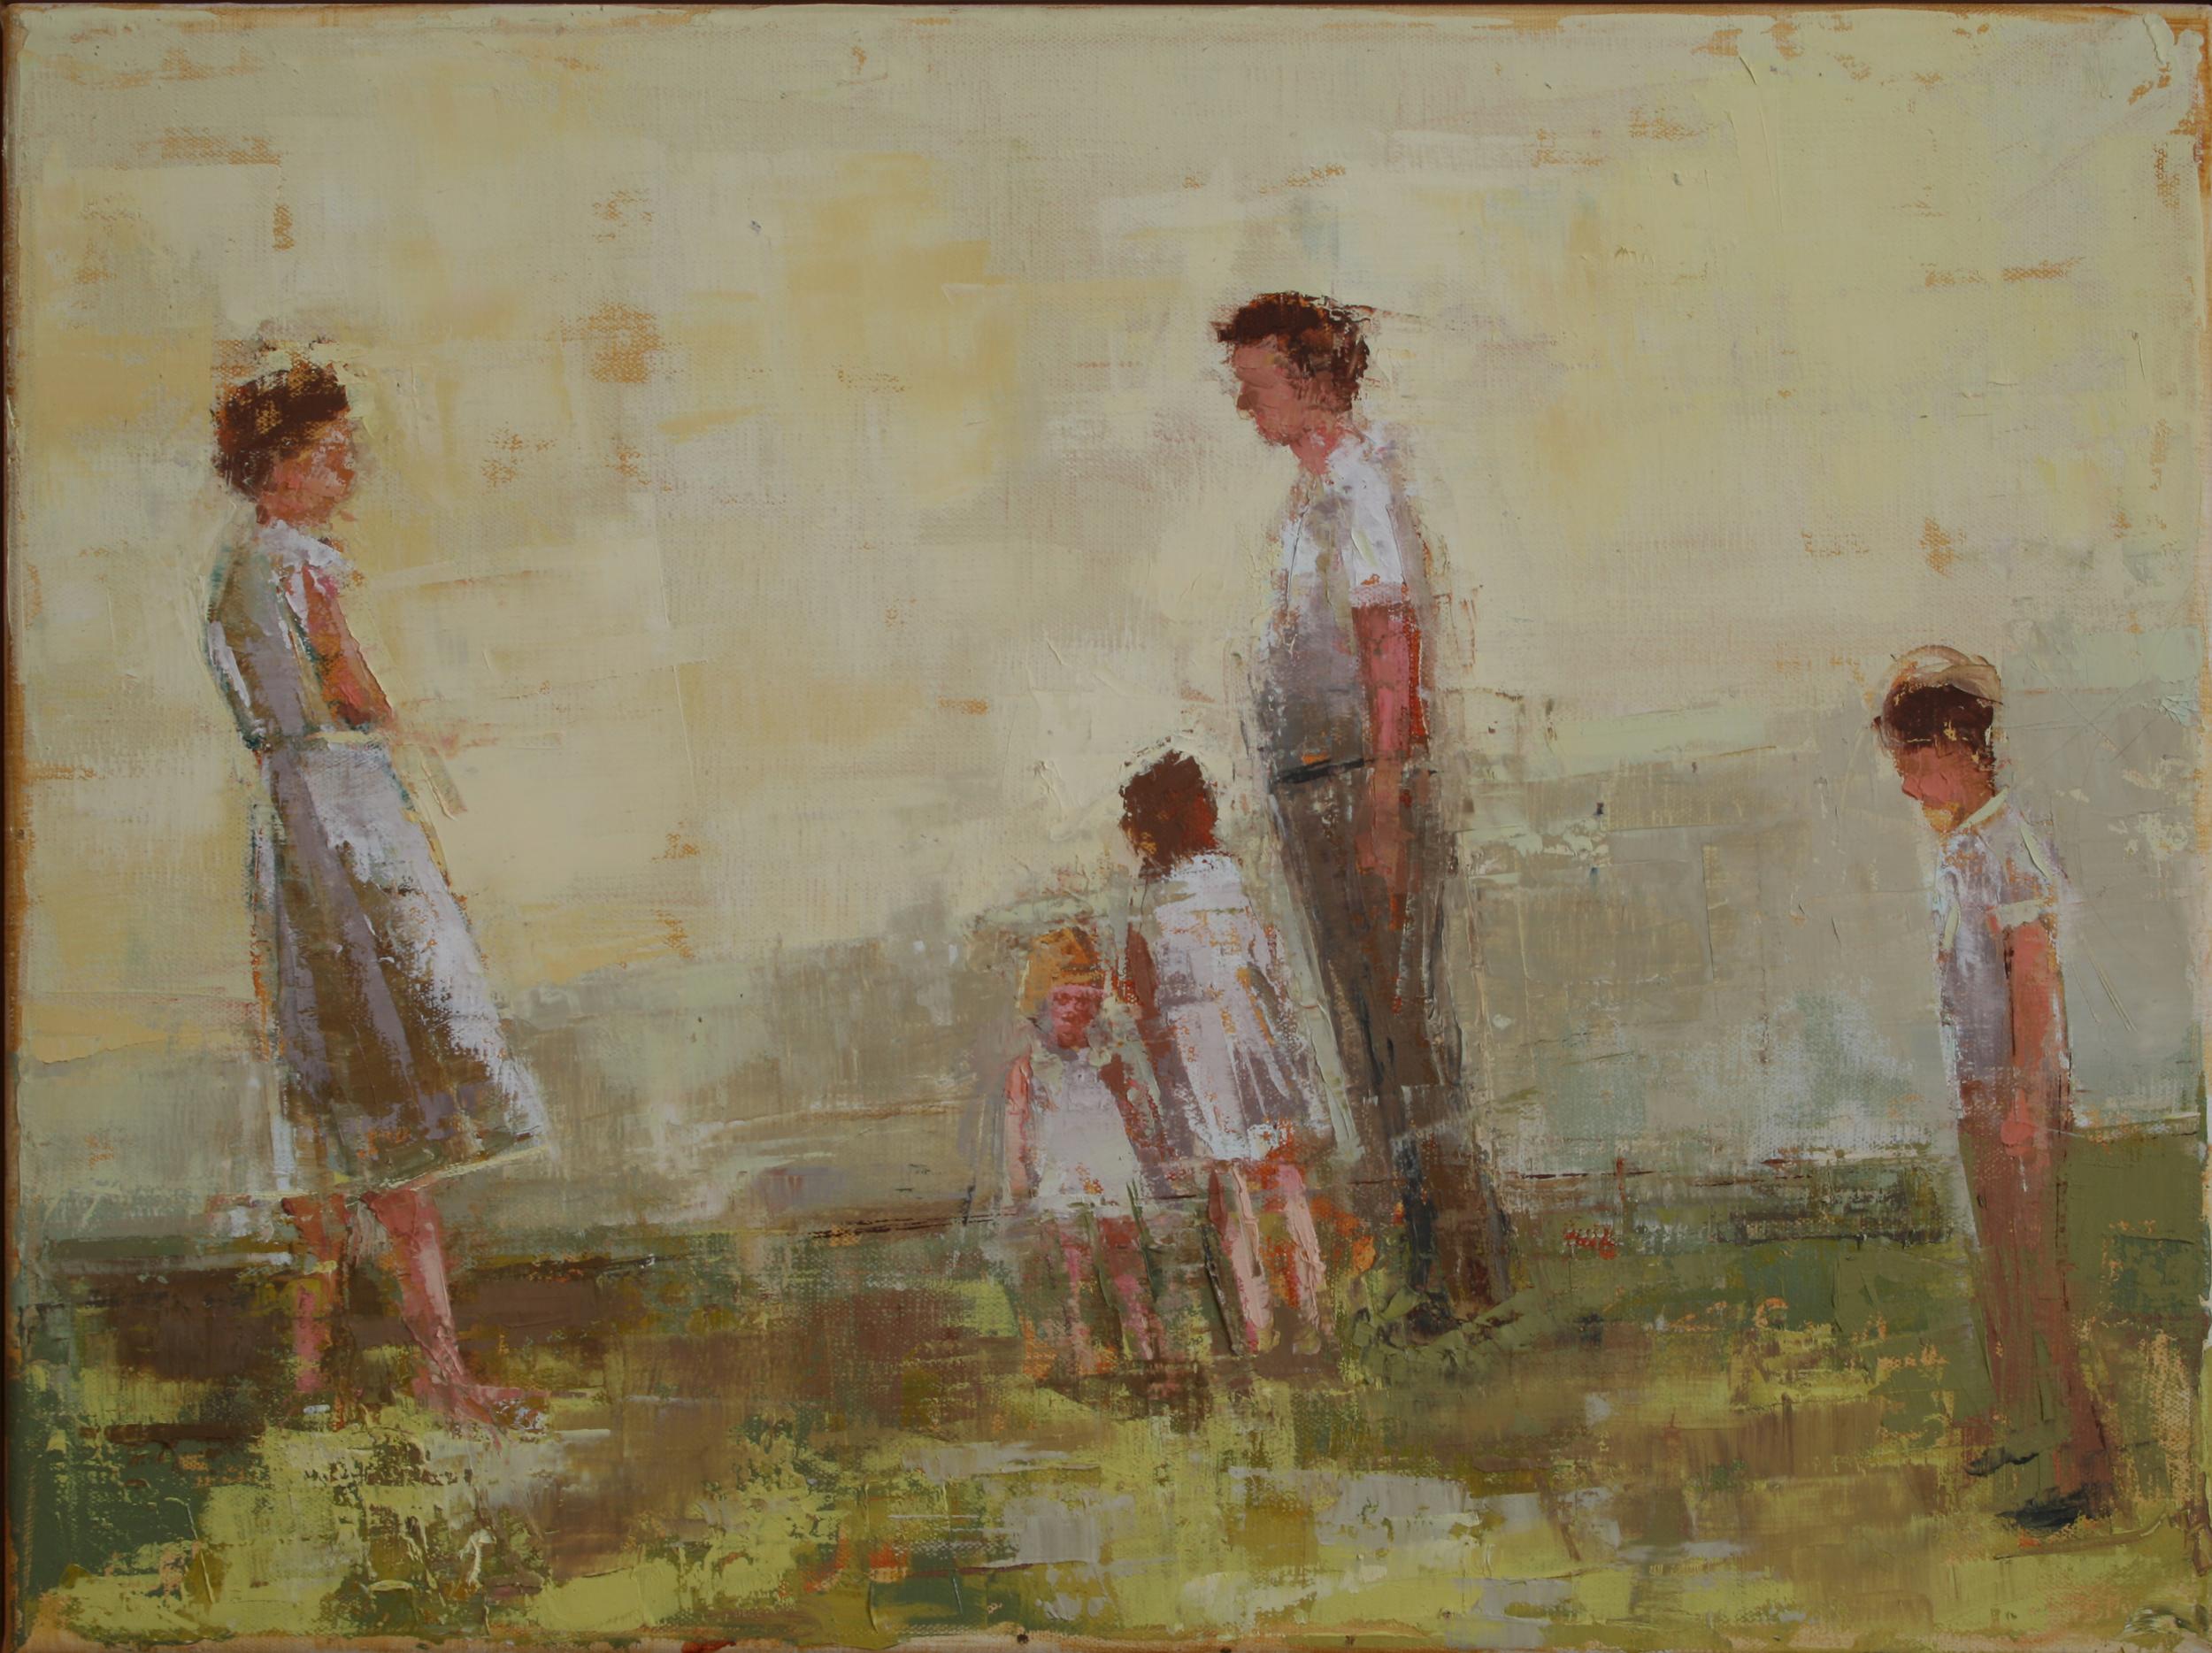 "The Edge, oil on linen, 12"" x 16"", 2010"